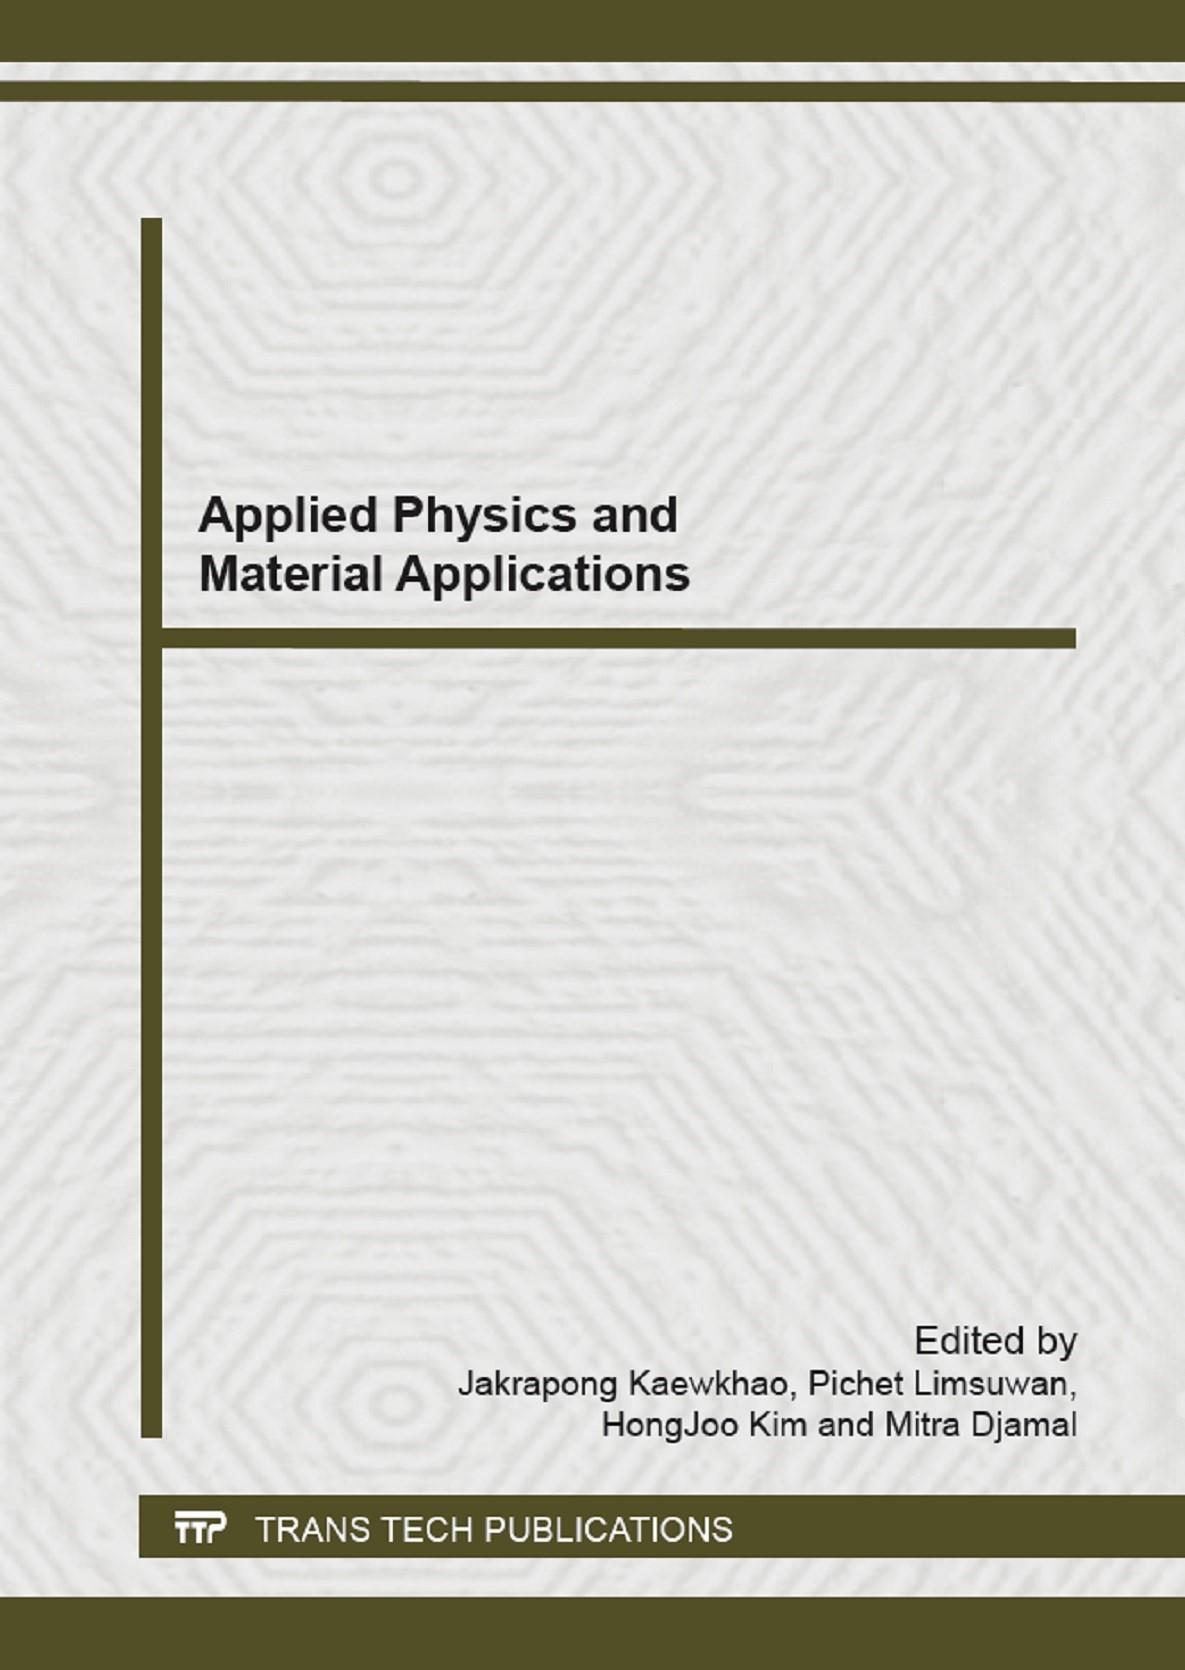 Applied Physics and Material Applications | Kaewkhao / Limsuwan / Kim / Djamal, 2013 | Buch (Cover)